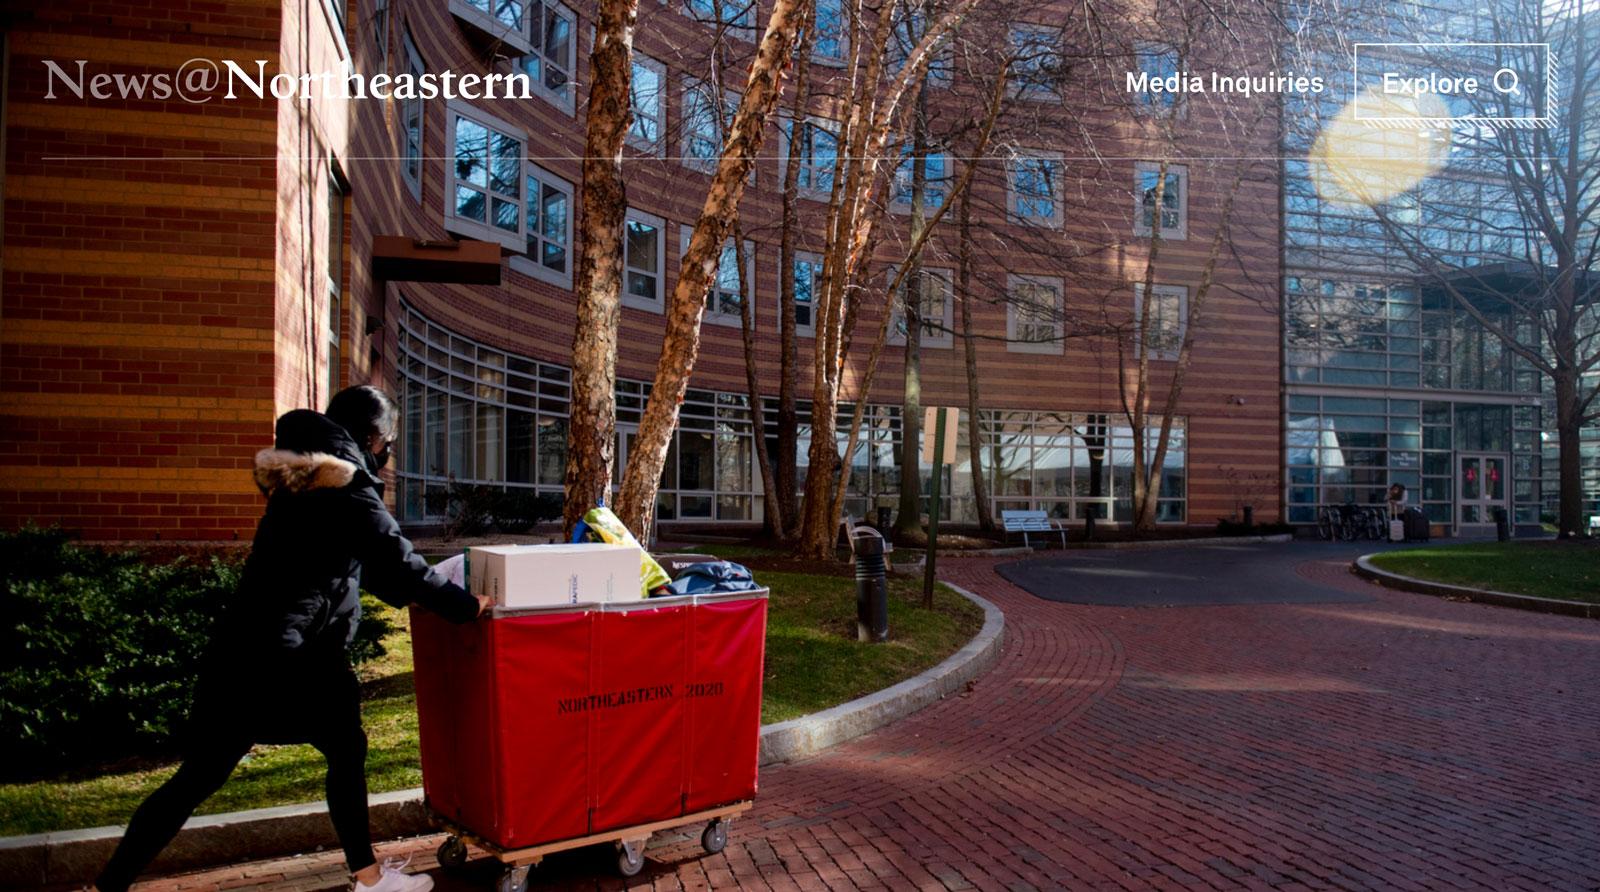 Tease image for Northeastern University